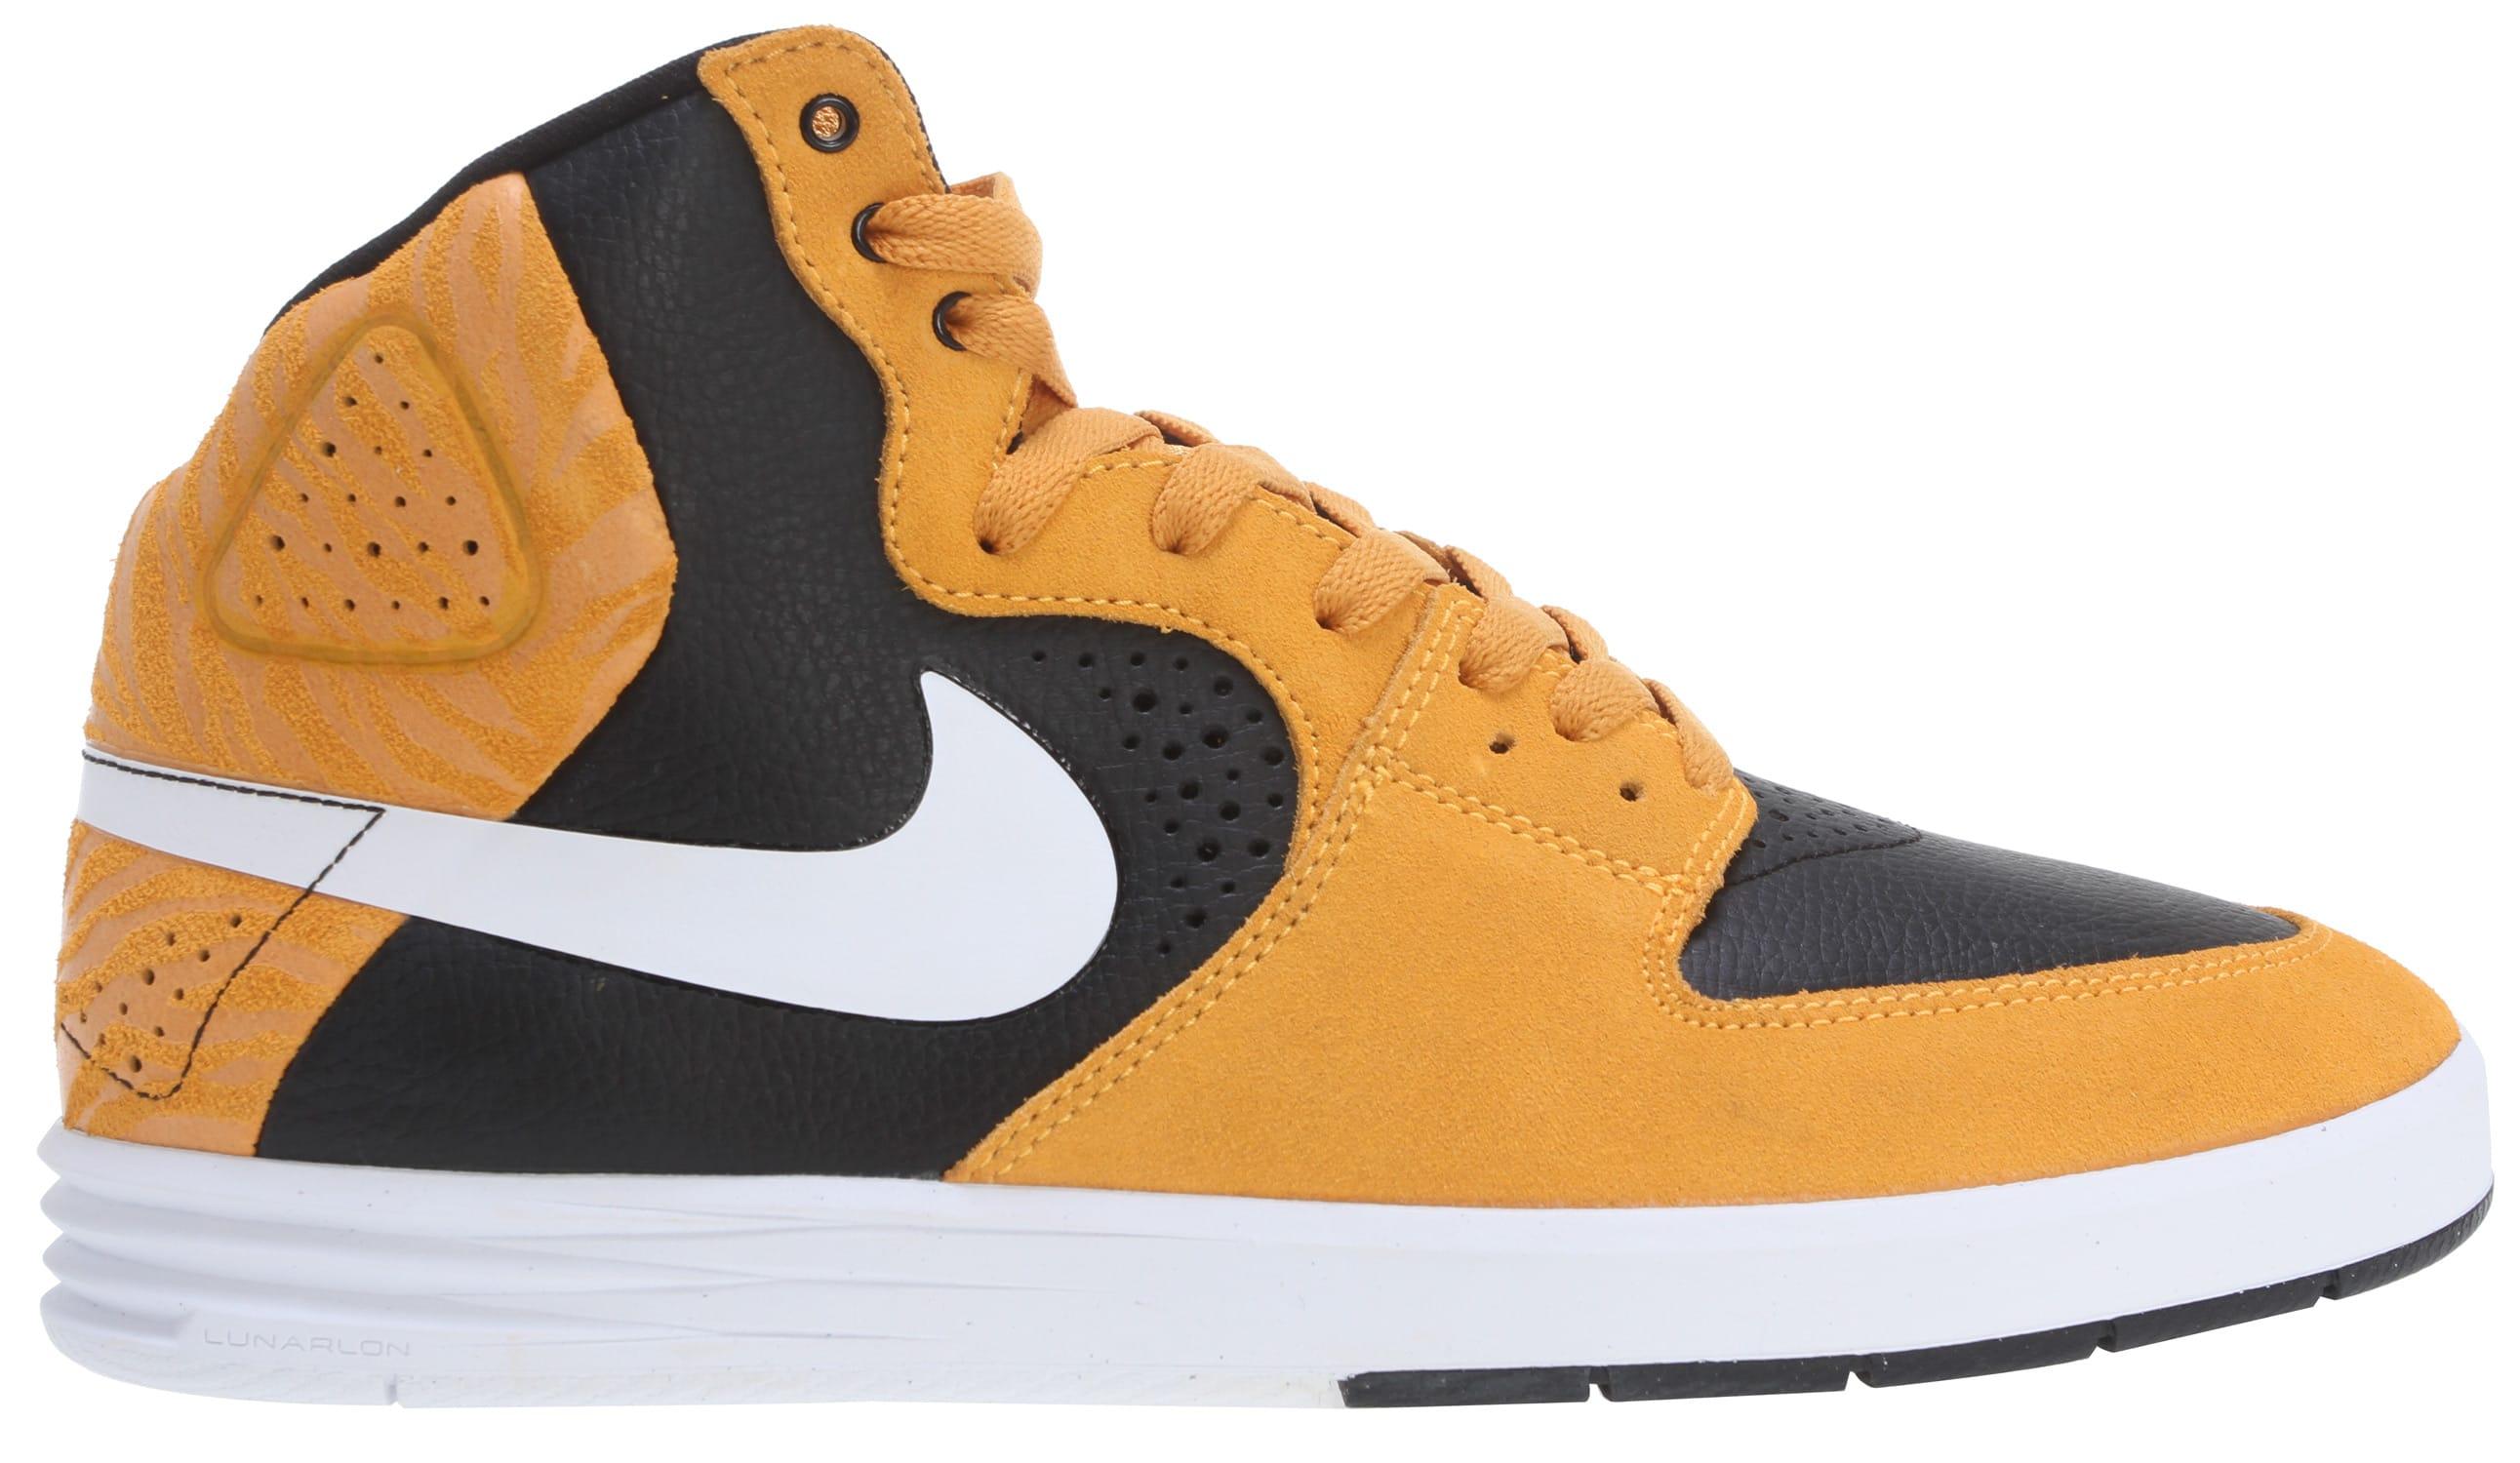 huge selection of f2b44 2dbc7 Nike Paul Rodriguez 7 High Skate Shoes - thumbnail 1